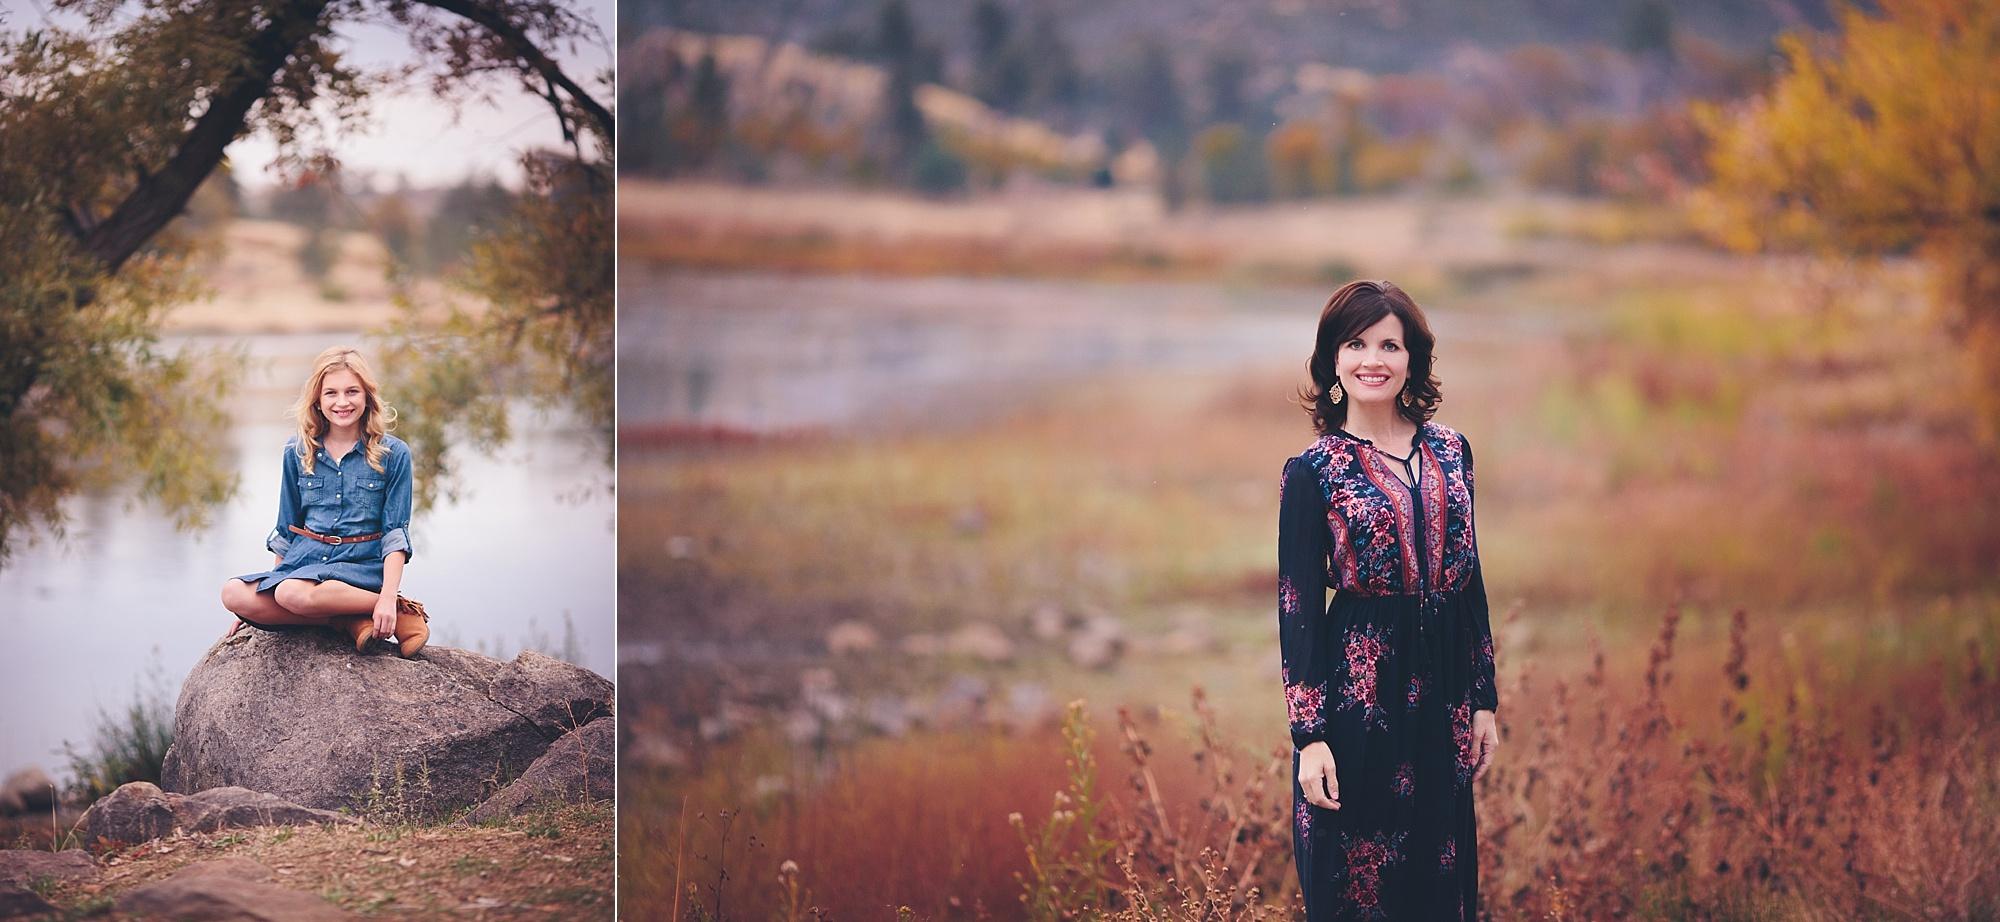 Melanie Monroe Photography | San Diego Photographer